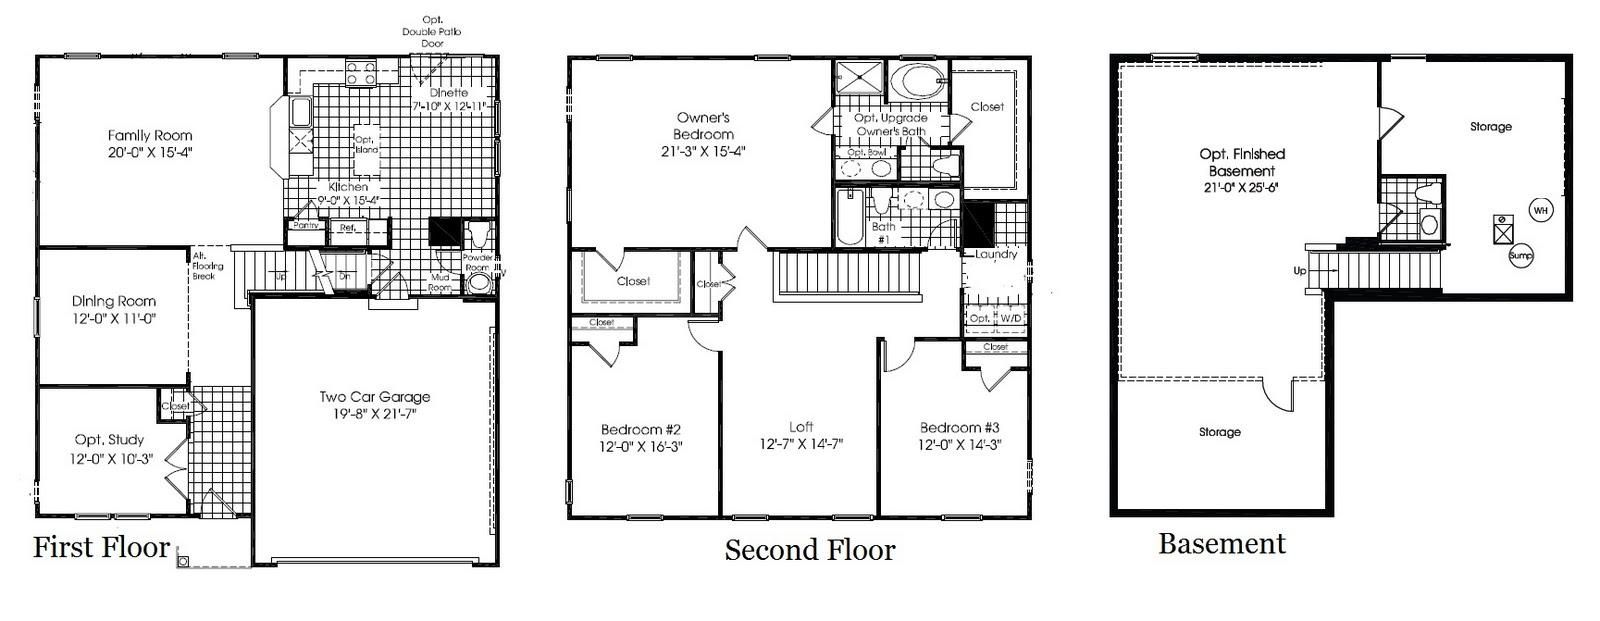 Ryan Homes Milan Interactive Floor Plan: Building 221: Introducing The Milan